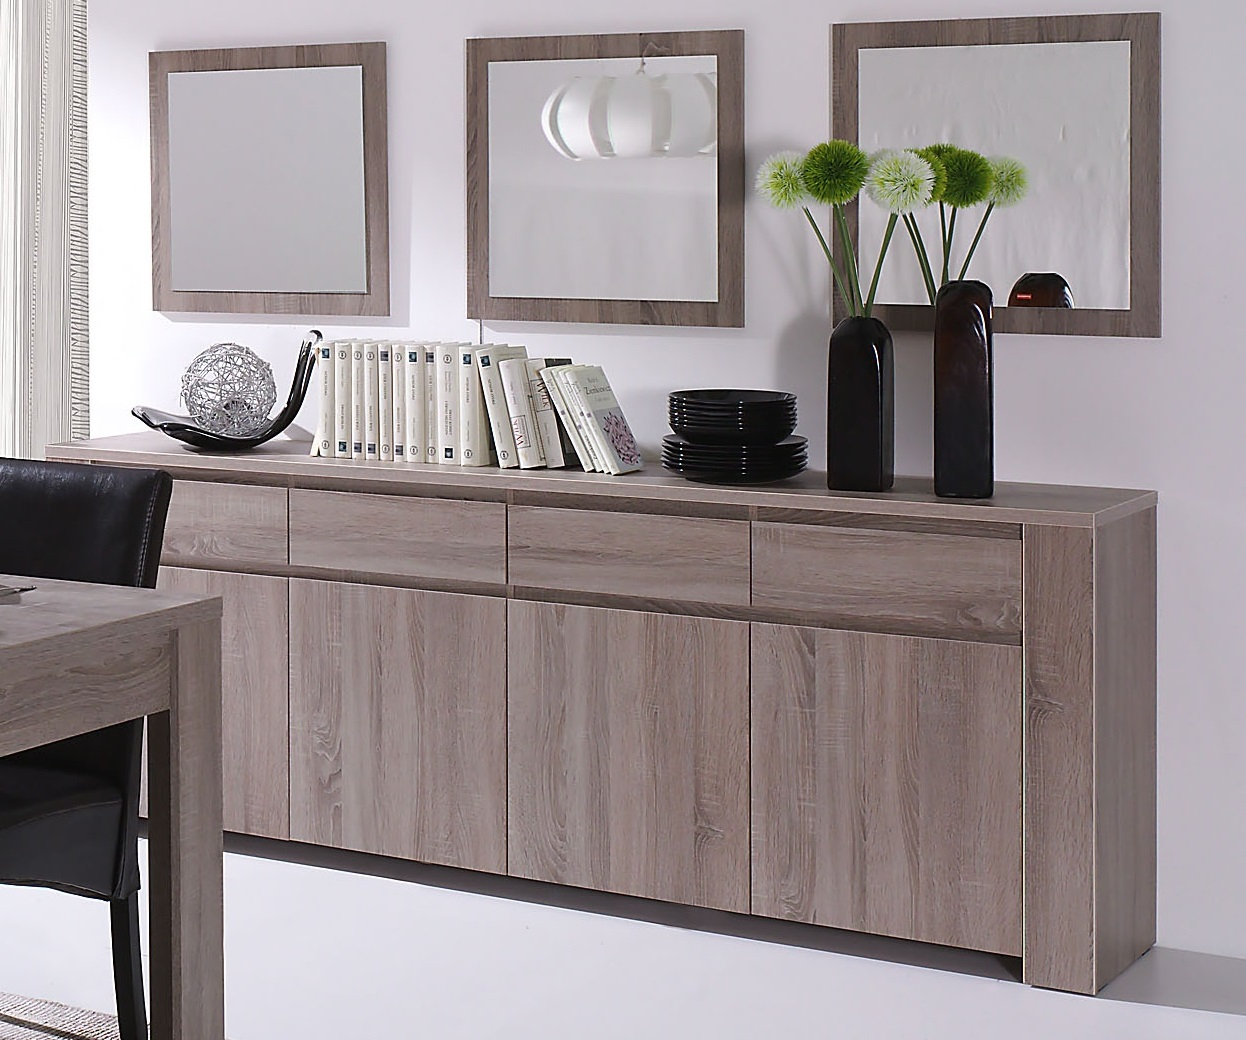 miroir carr contemporain ch ne truffe indra. Black Bedroom Furniture Sets. Home Design Ideas